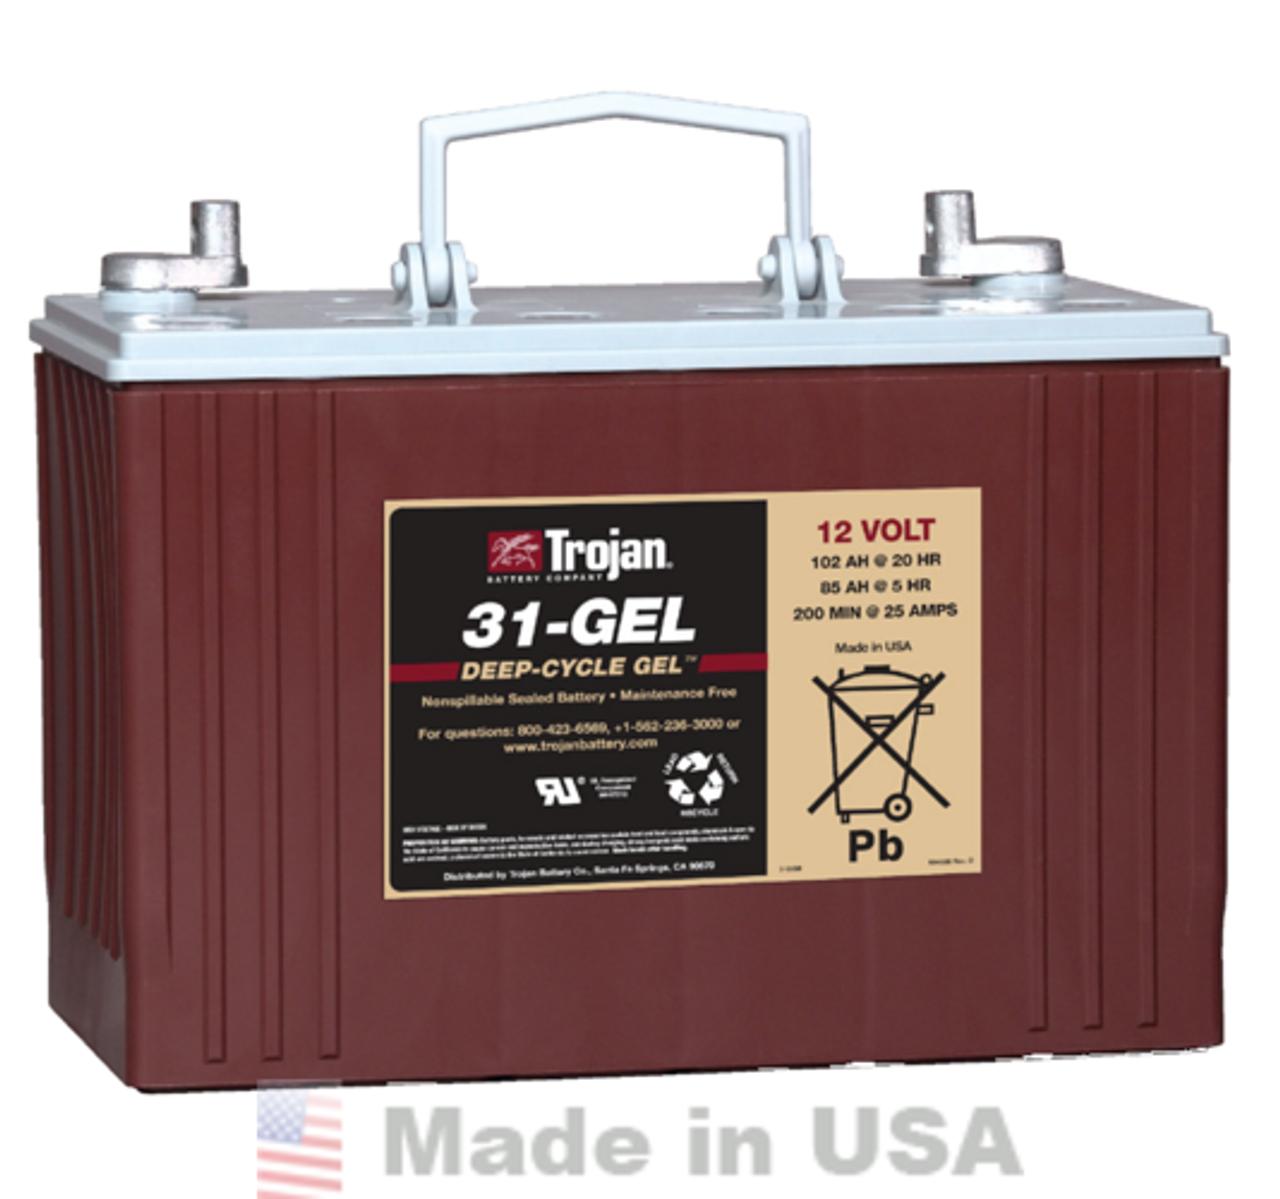 Trojan 31-GEL 12V, 102AH (20HR) Gel Battery